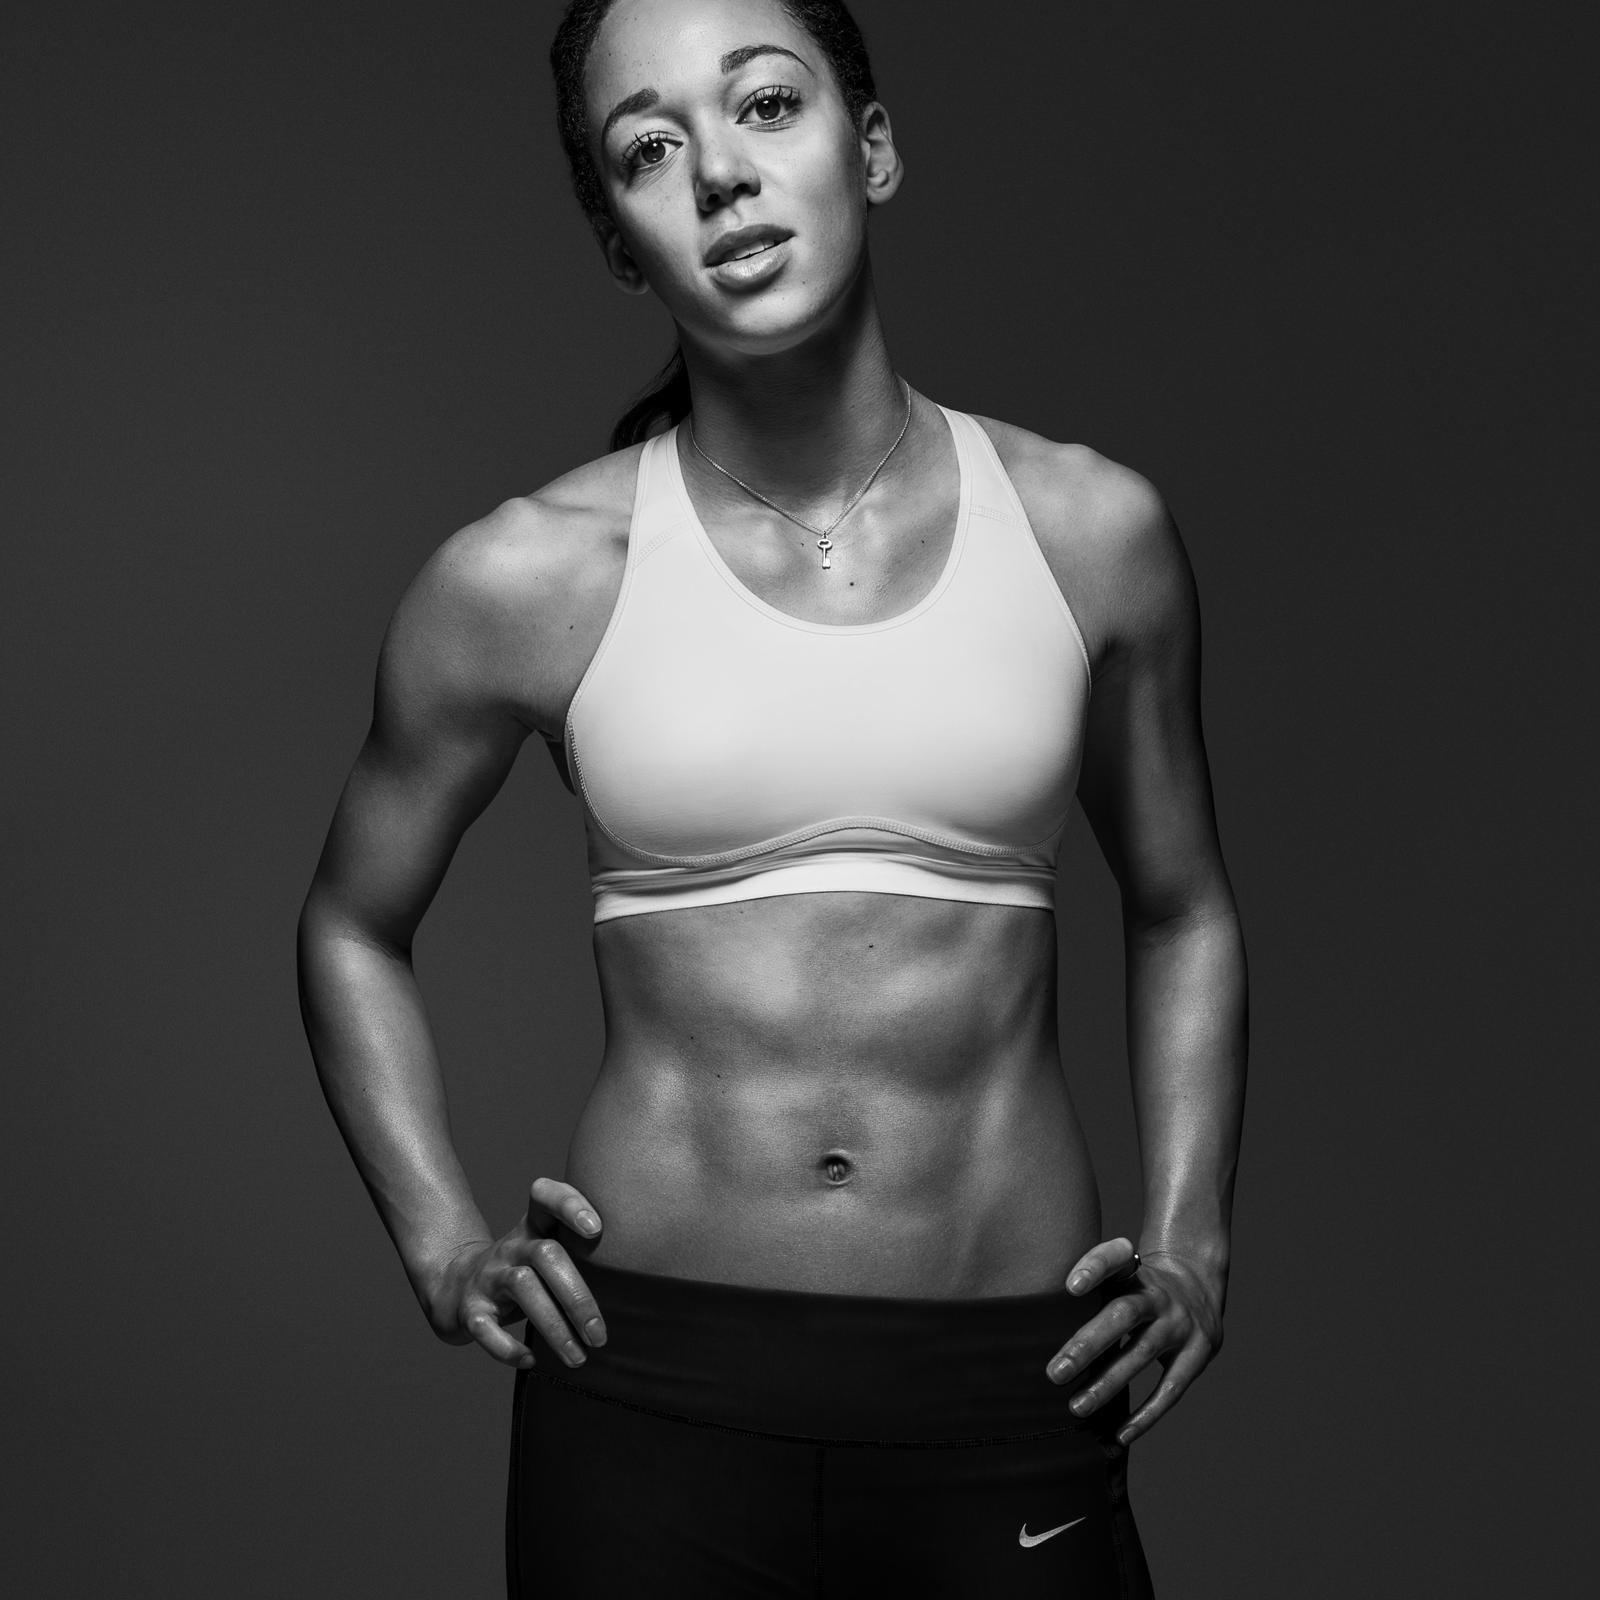 Nike_ZoomSquad_Katarina_Johnson-Thompson_square_1600